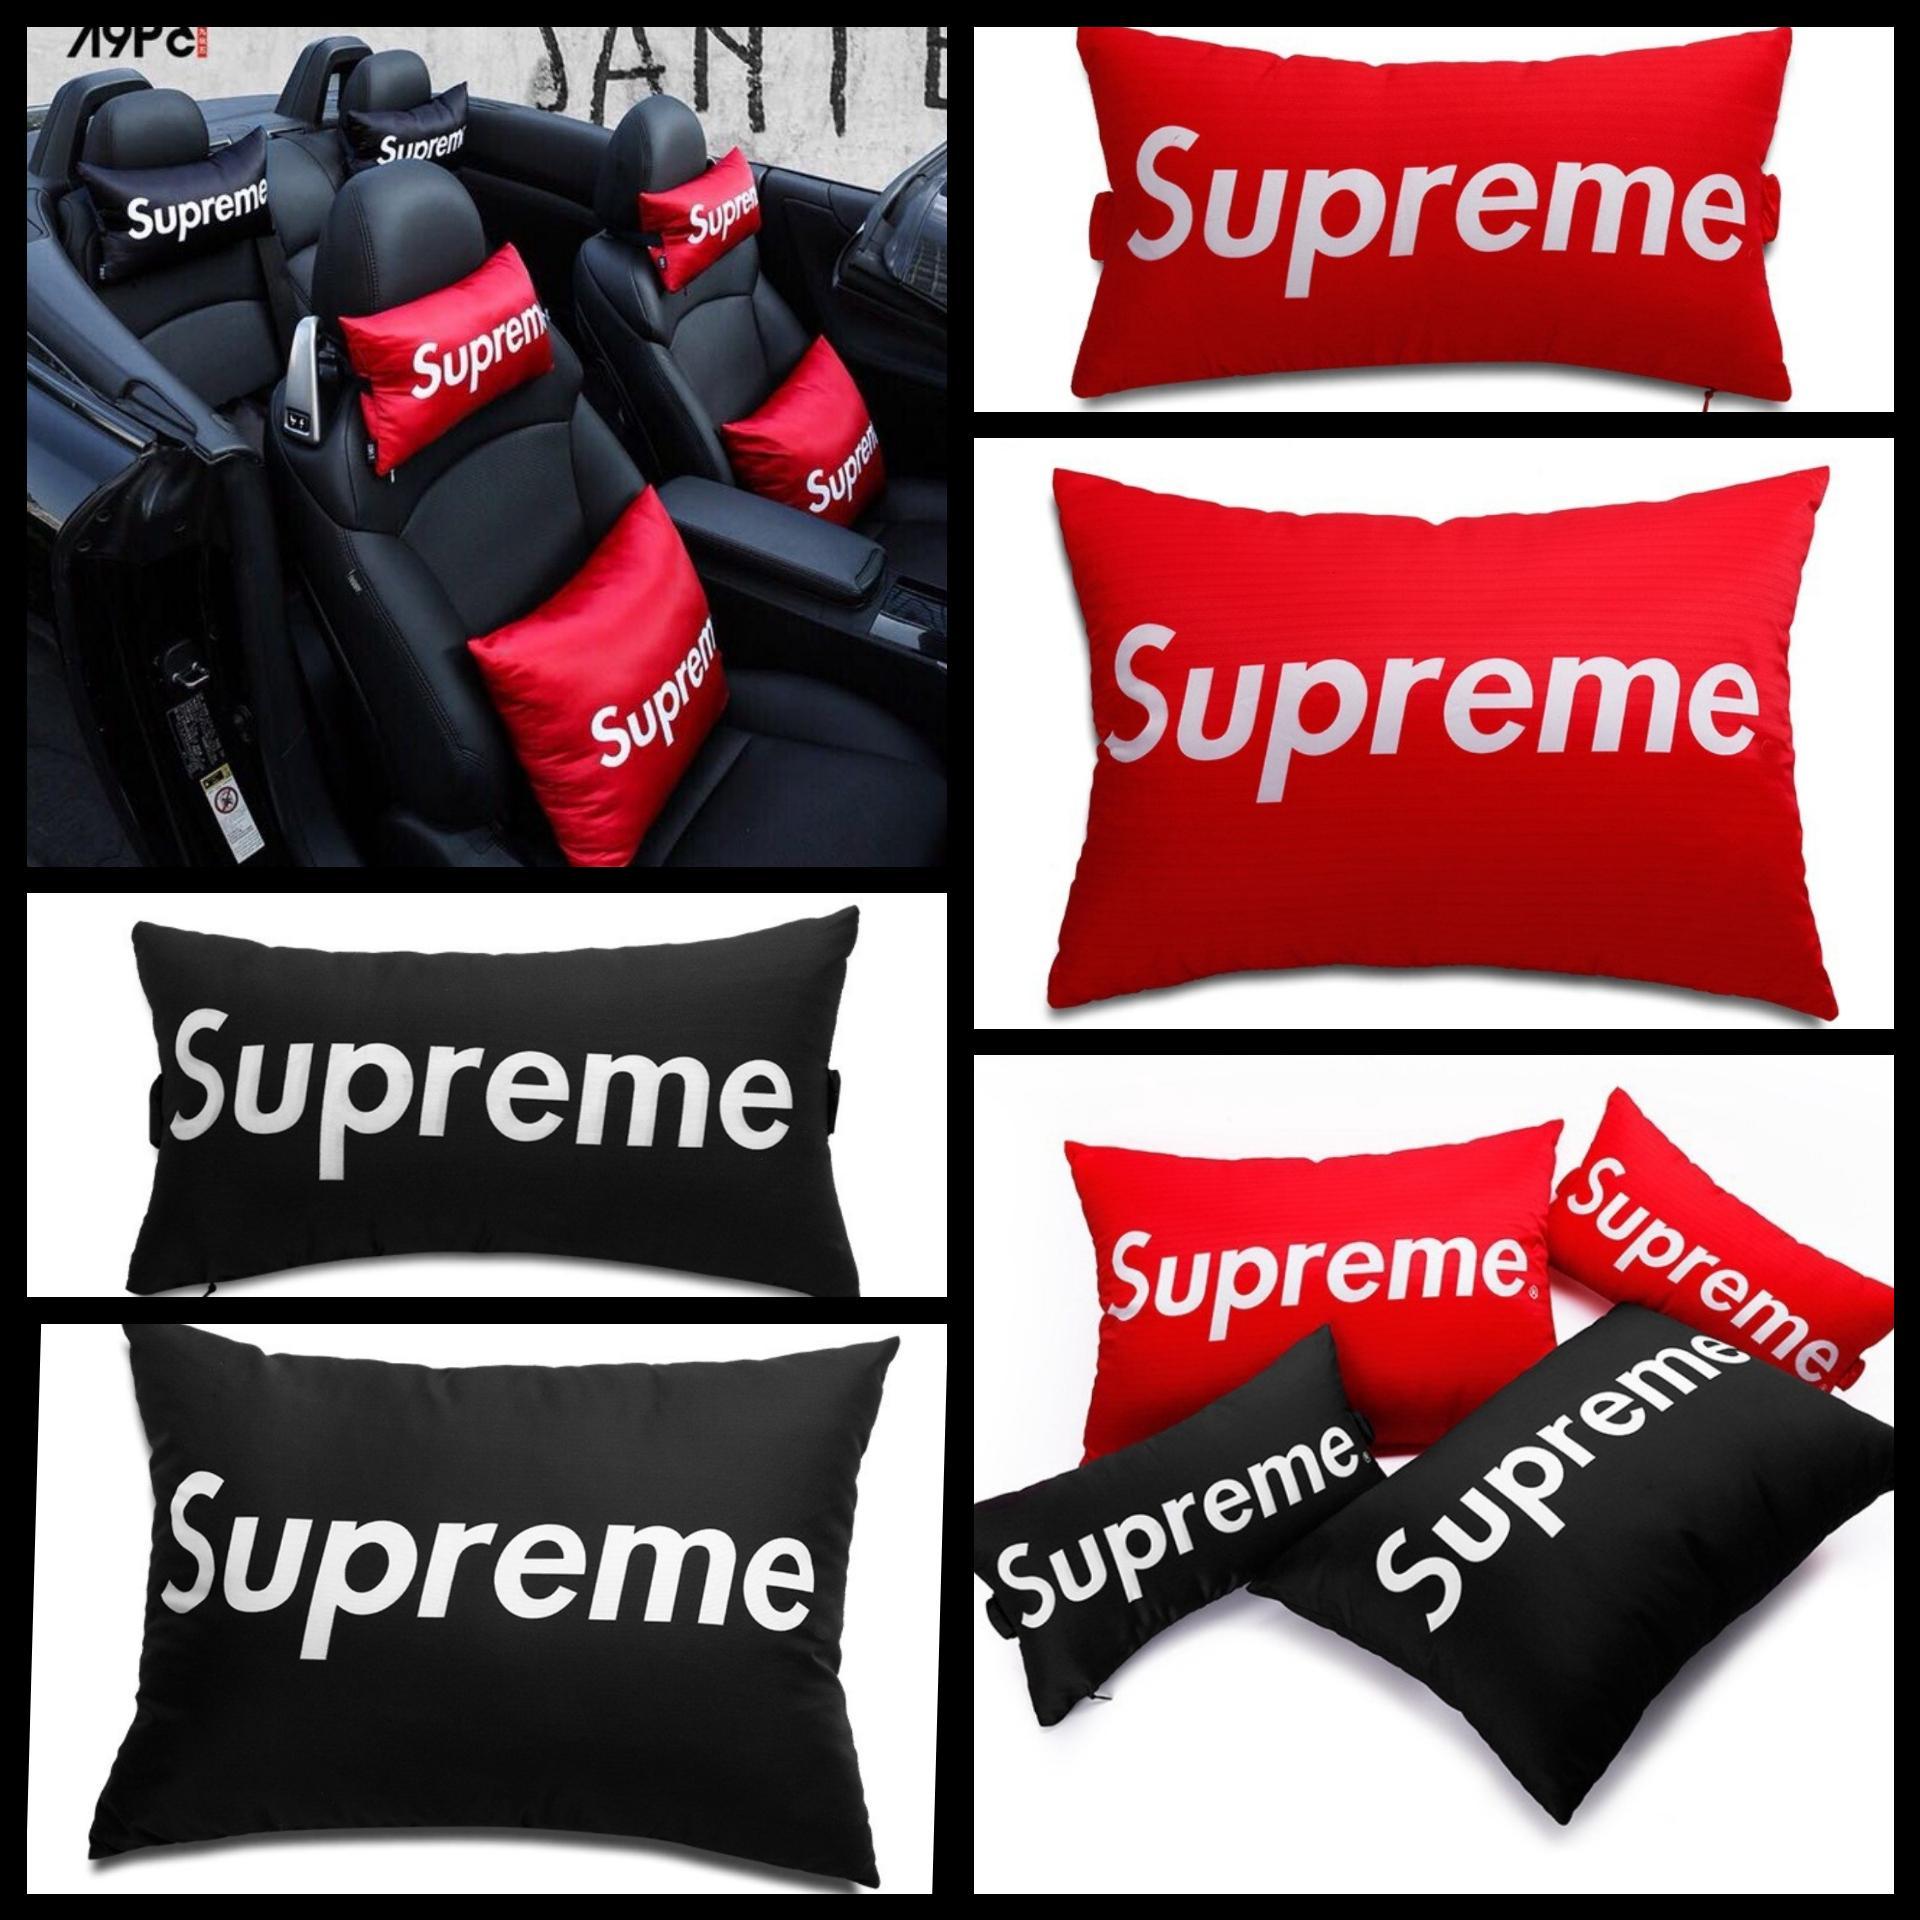 "25/"" x 25/"" x 5/"" Classic Accessories Cushion Slip Cover"